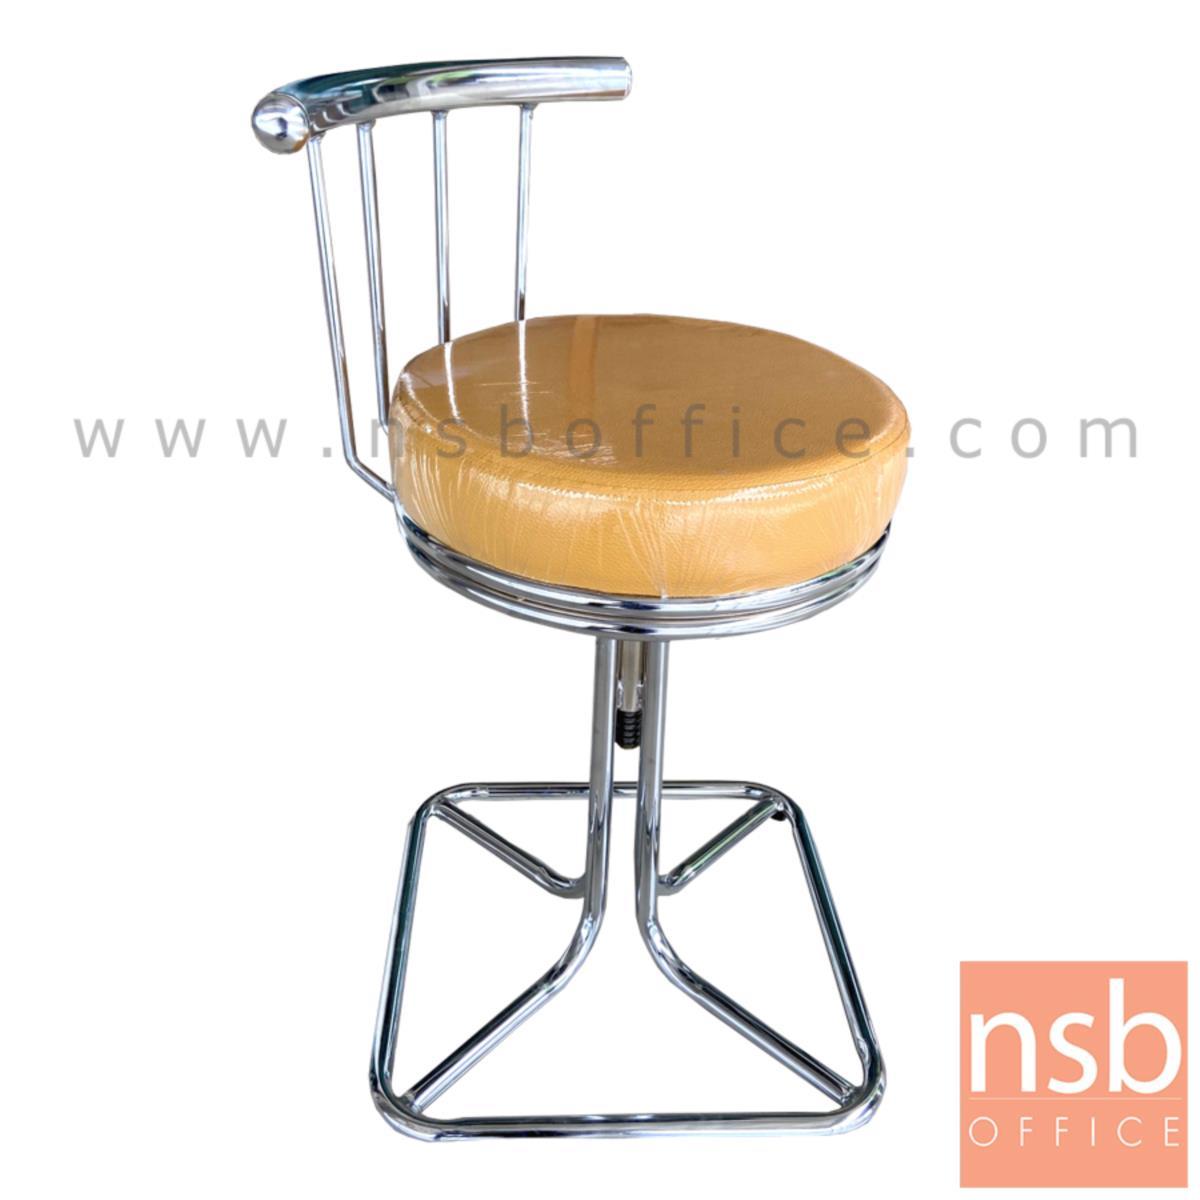 B09A001:เก้าอี้บาร์ที่นั่งกลม รุ่น CS-017 ขาเหล็ก